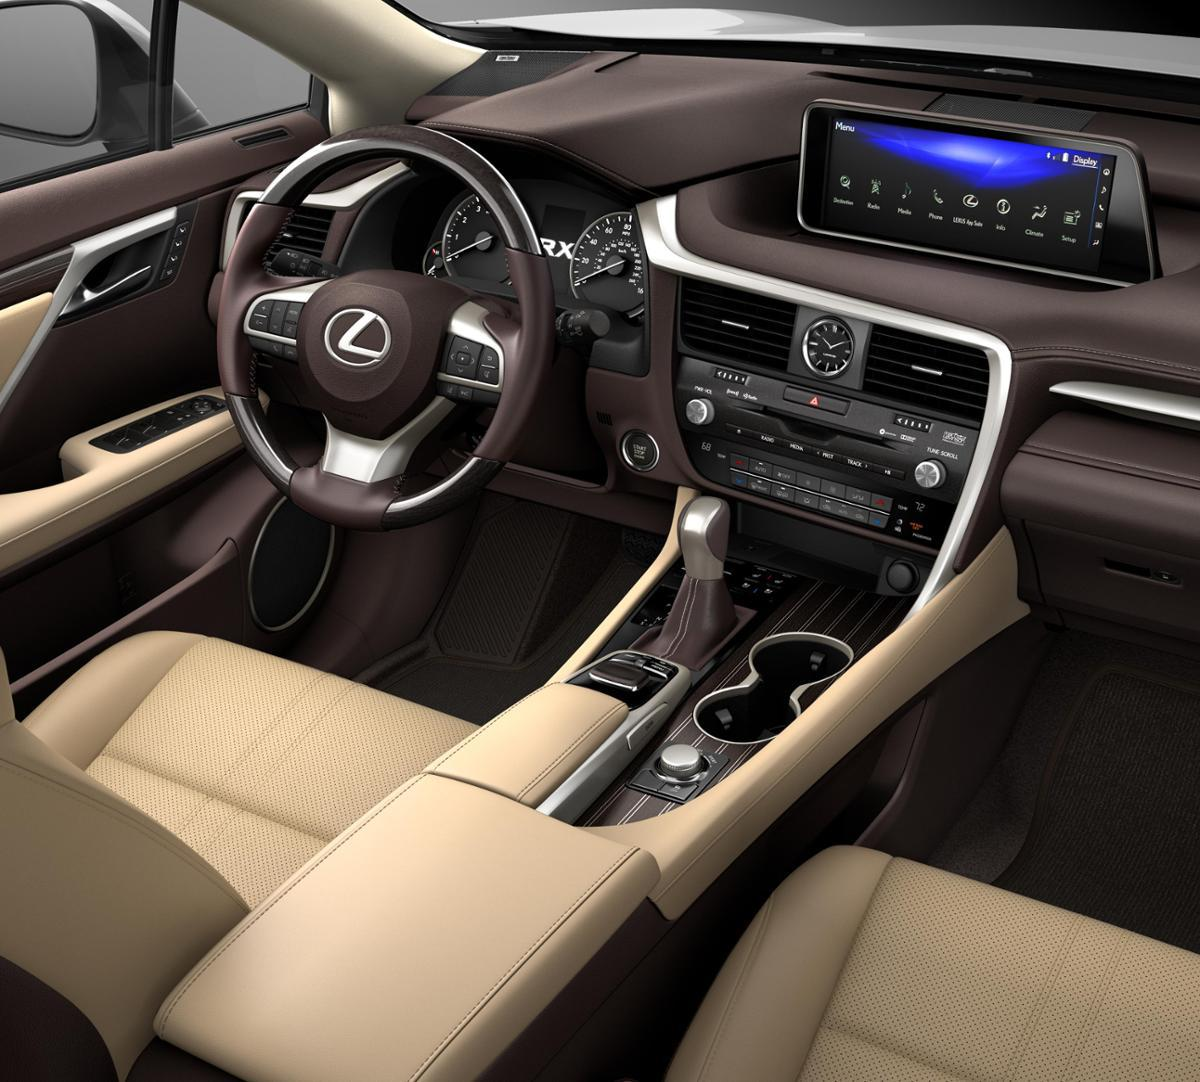 Lexus Rx 350 Lease: 2019 Lexus RX 350 For Sale In Oklahoma City